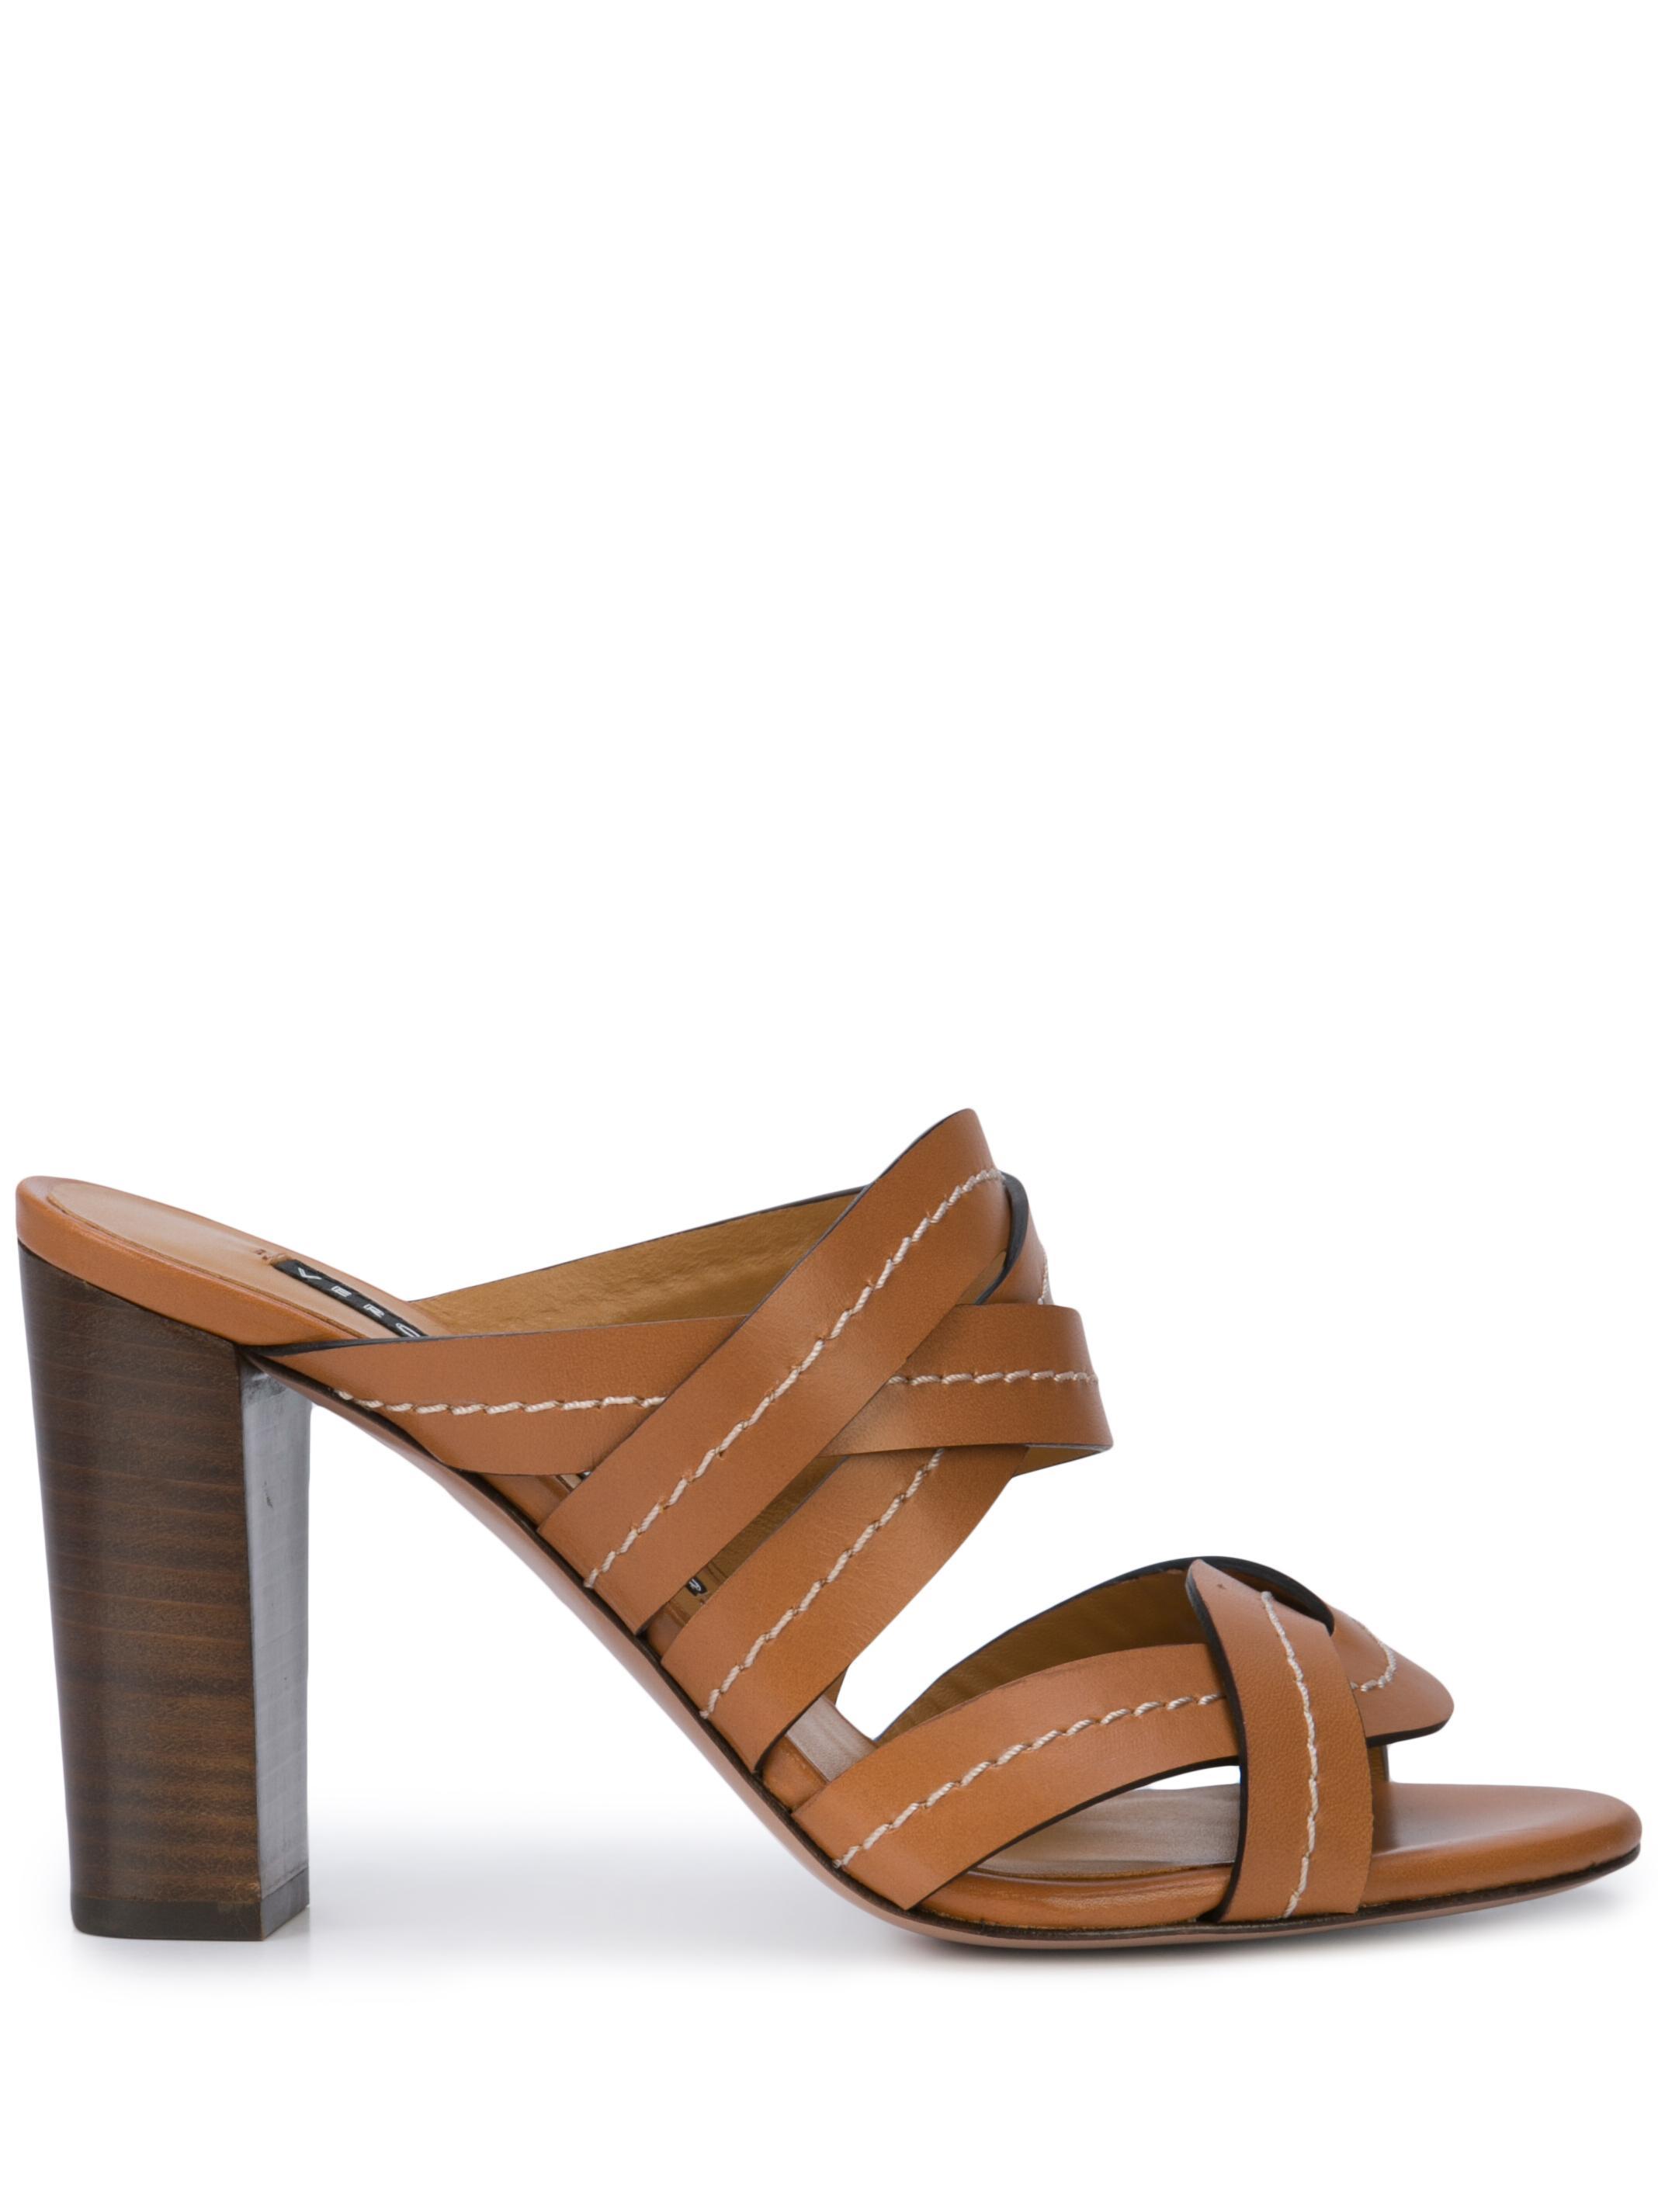 Criss Cross Stitch Leather Hihl Sandal Item # MACEY